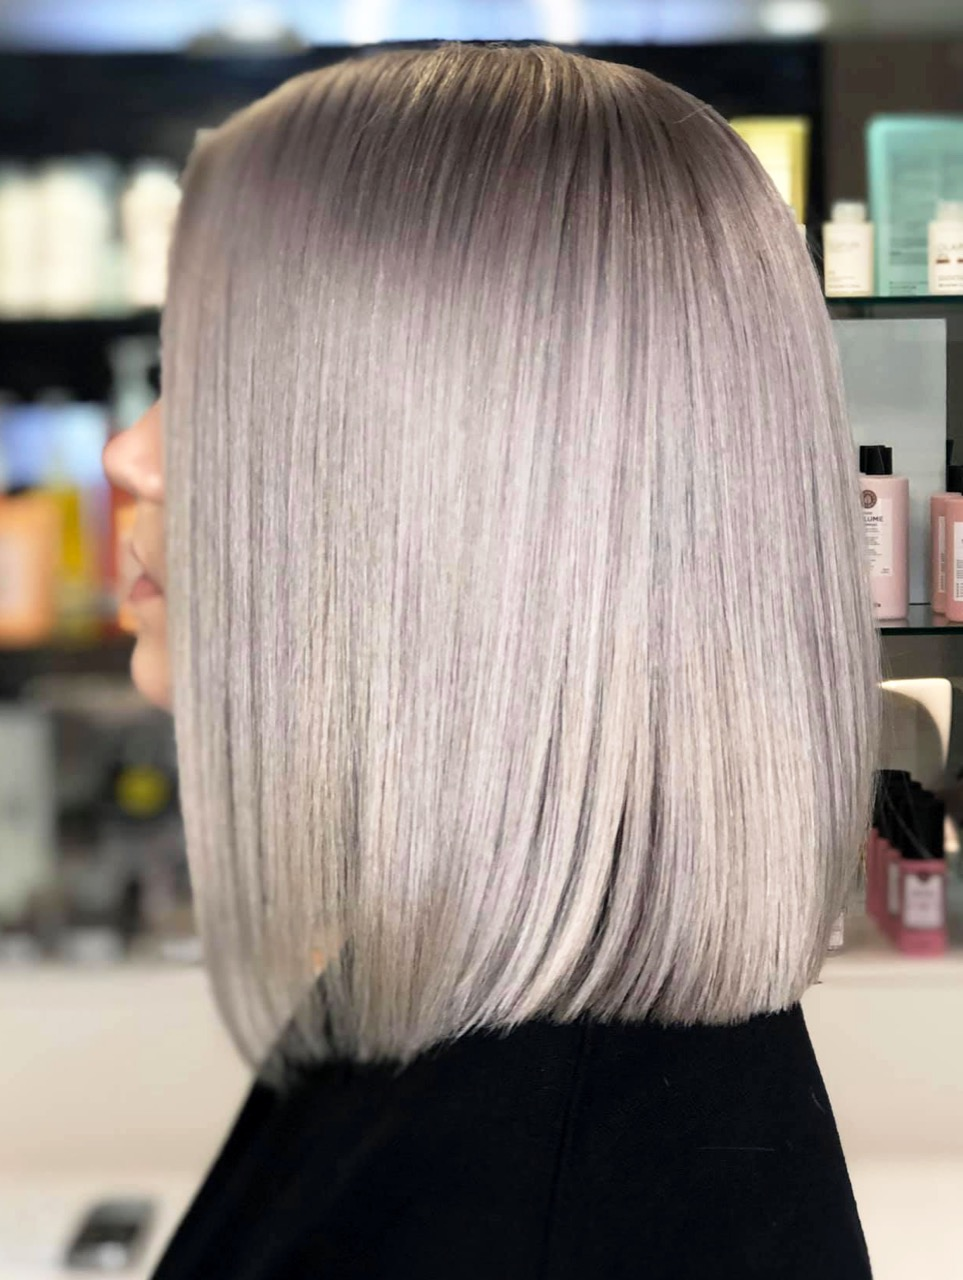 Lange haare frisuren frauen Die 30